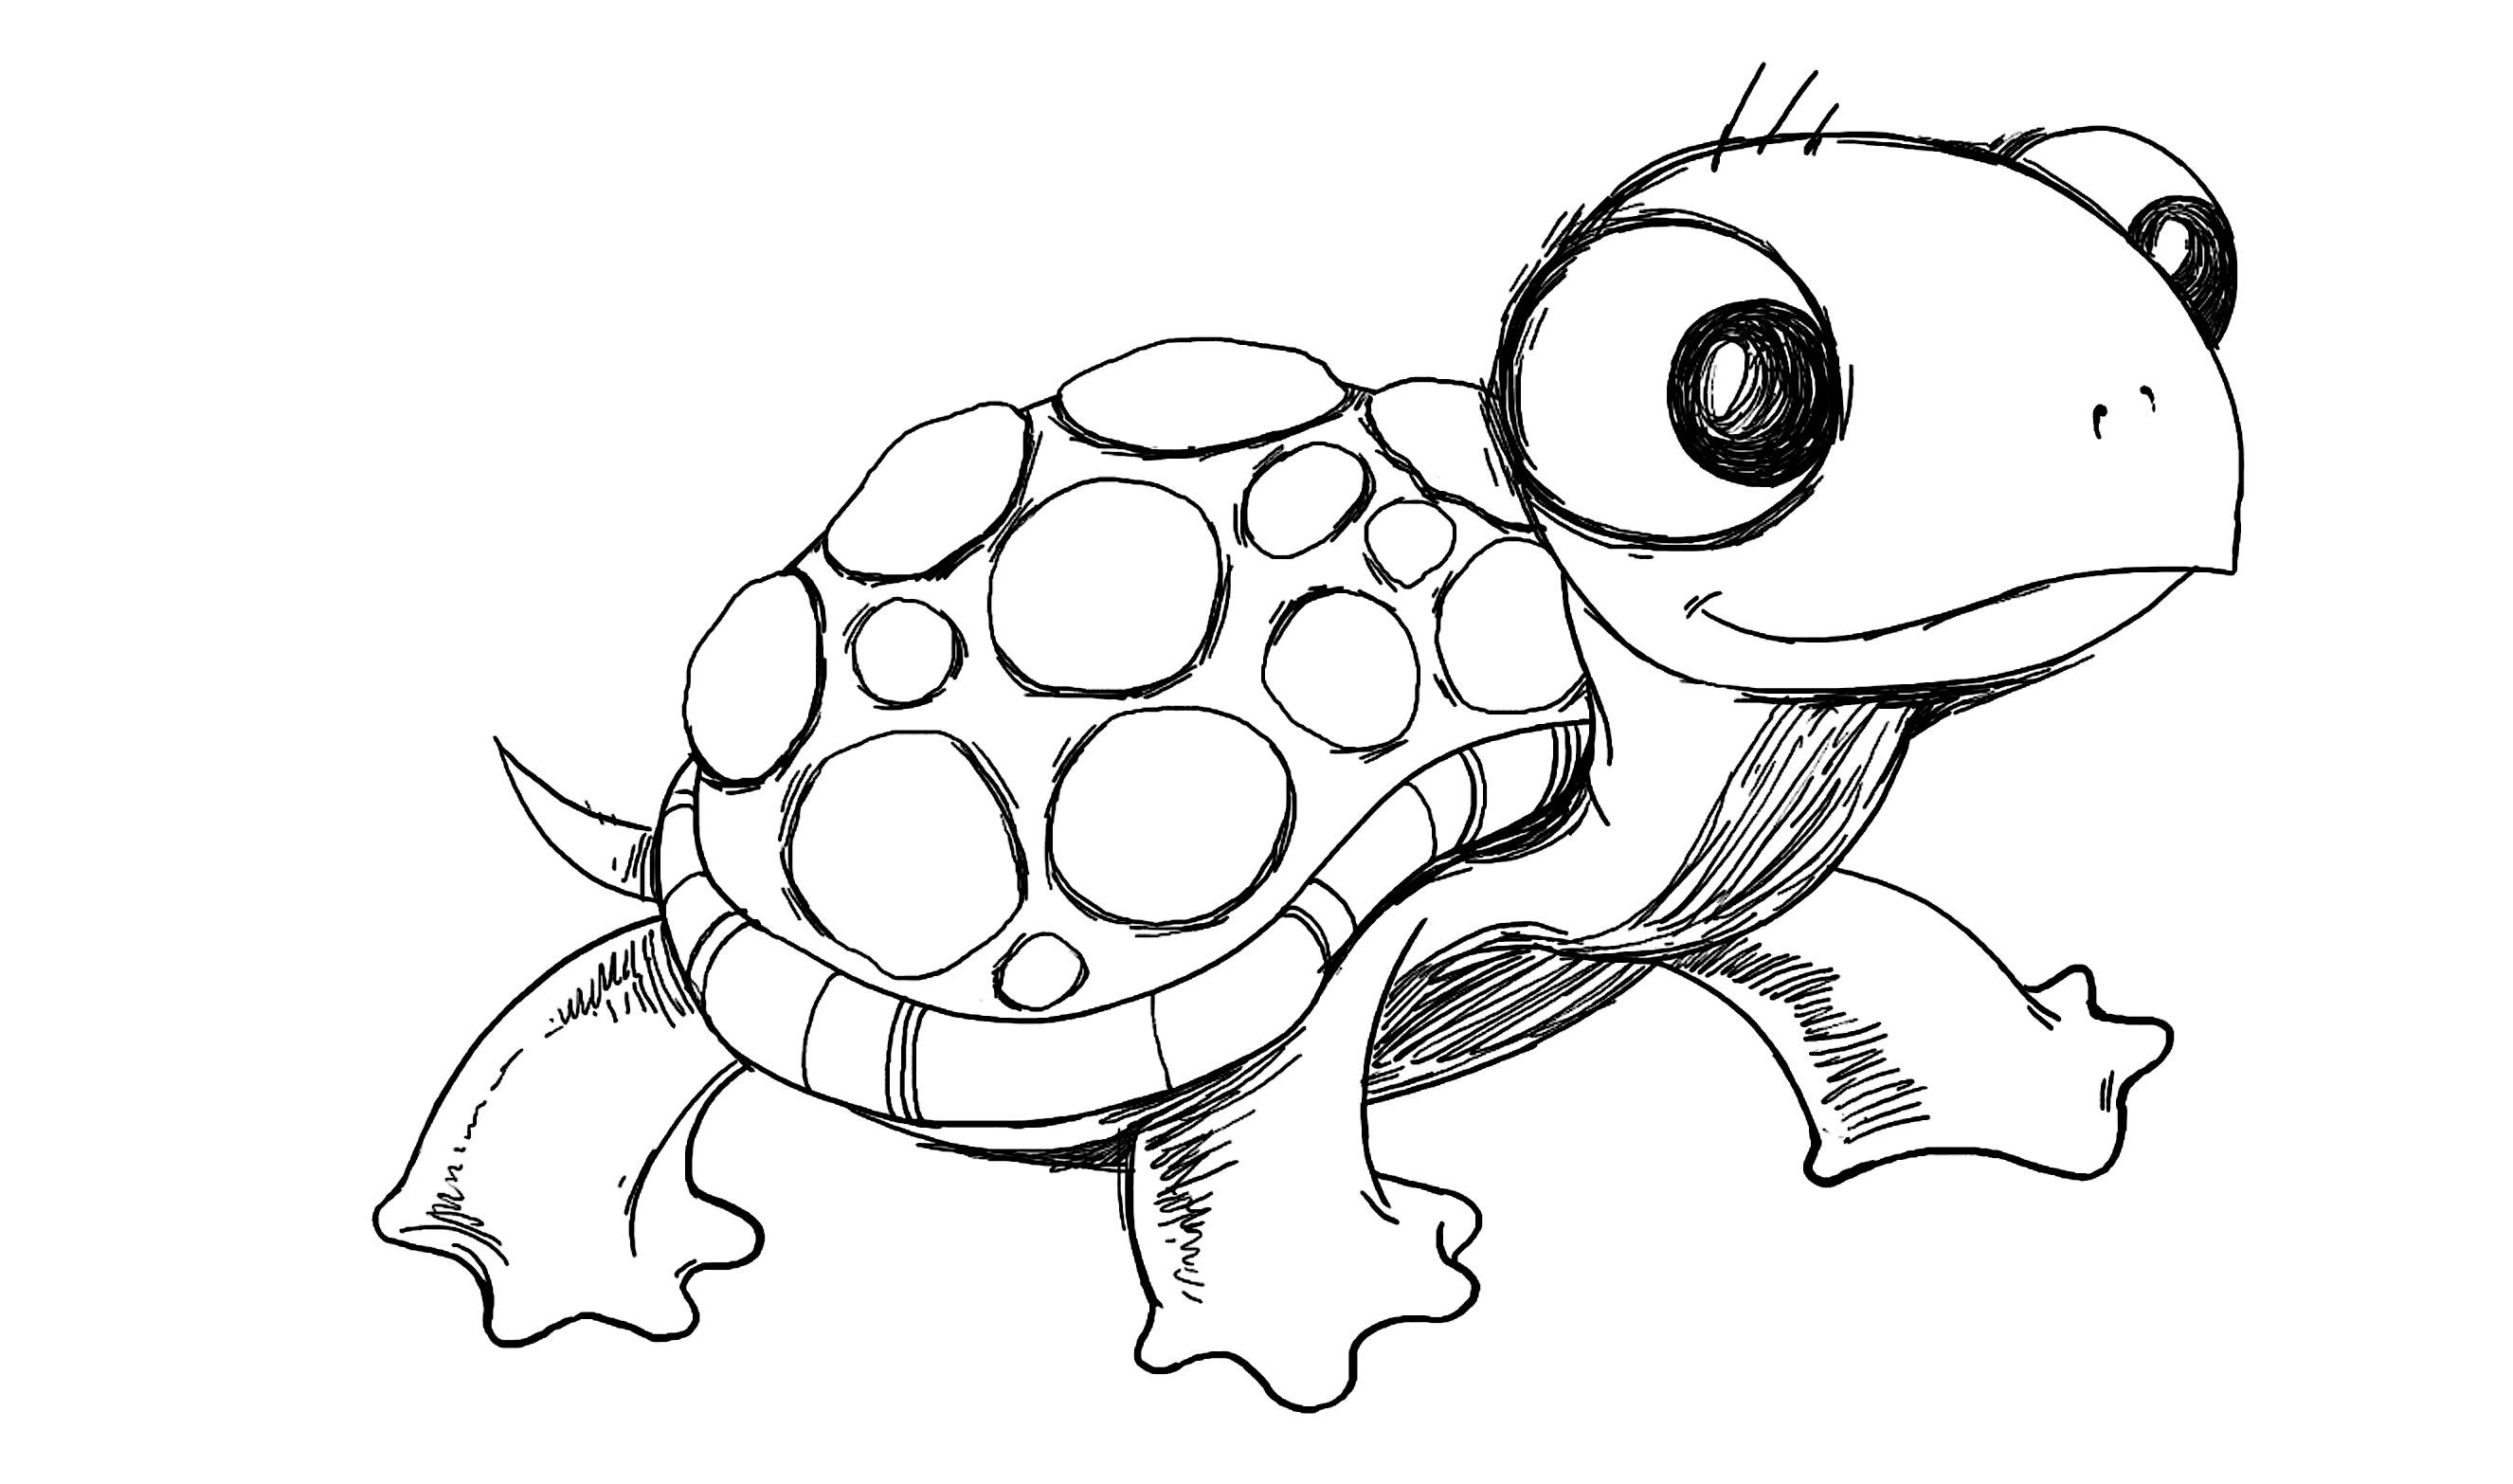 Turtle Image Drawing At Getdrawings